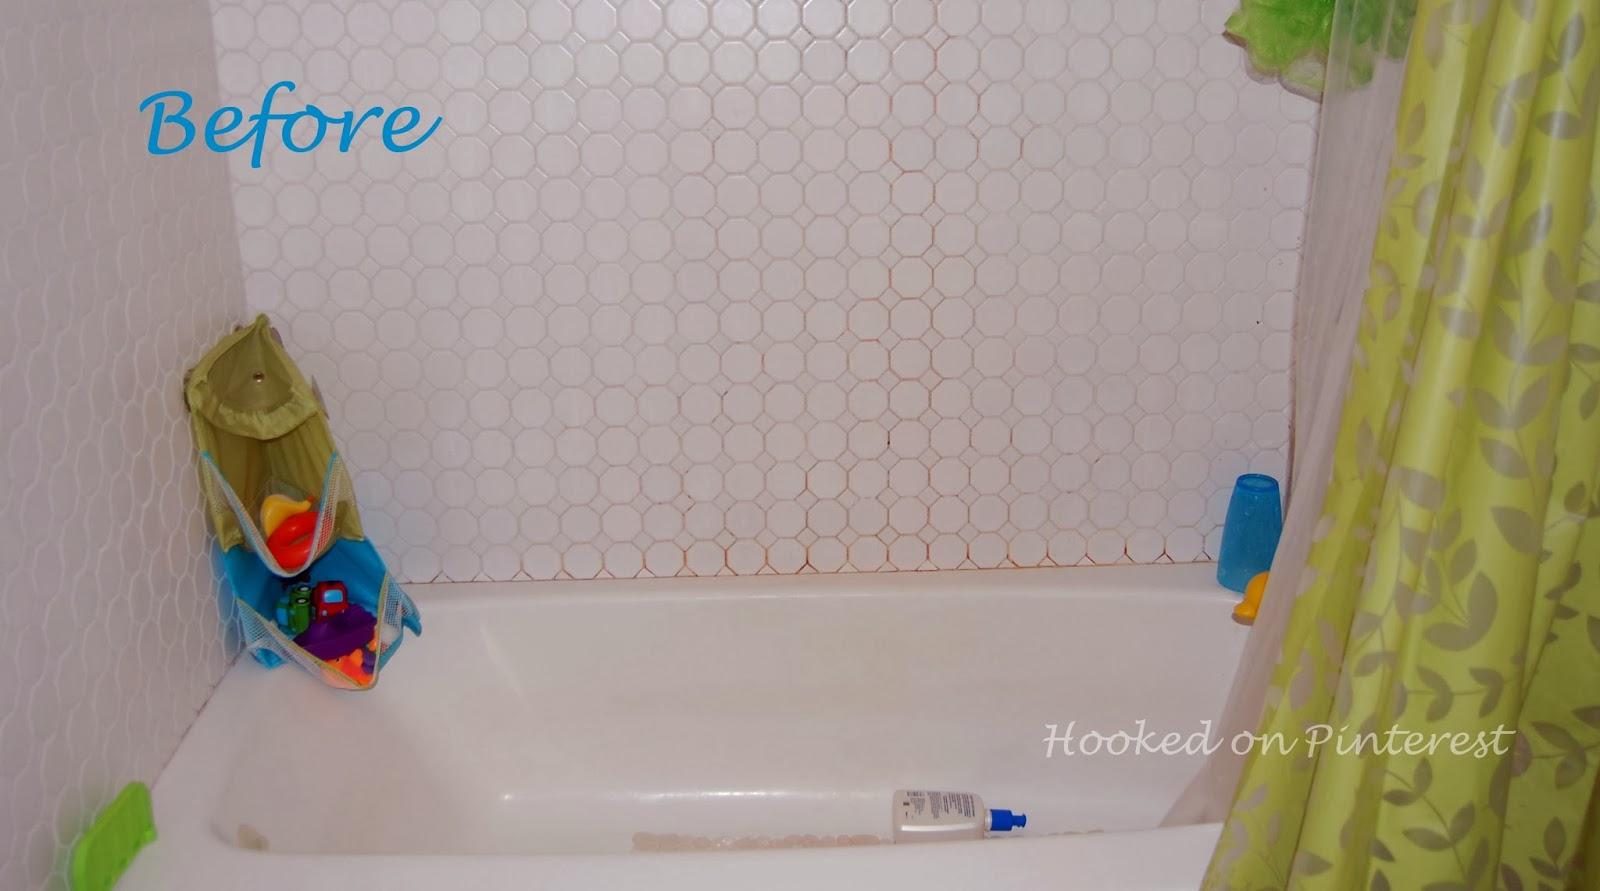 Bathroom Toys Storage Hooked On Pinterest Organization Bath Toy Storage